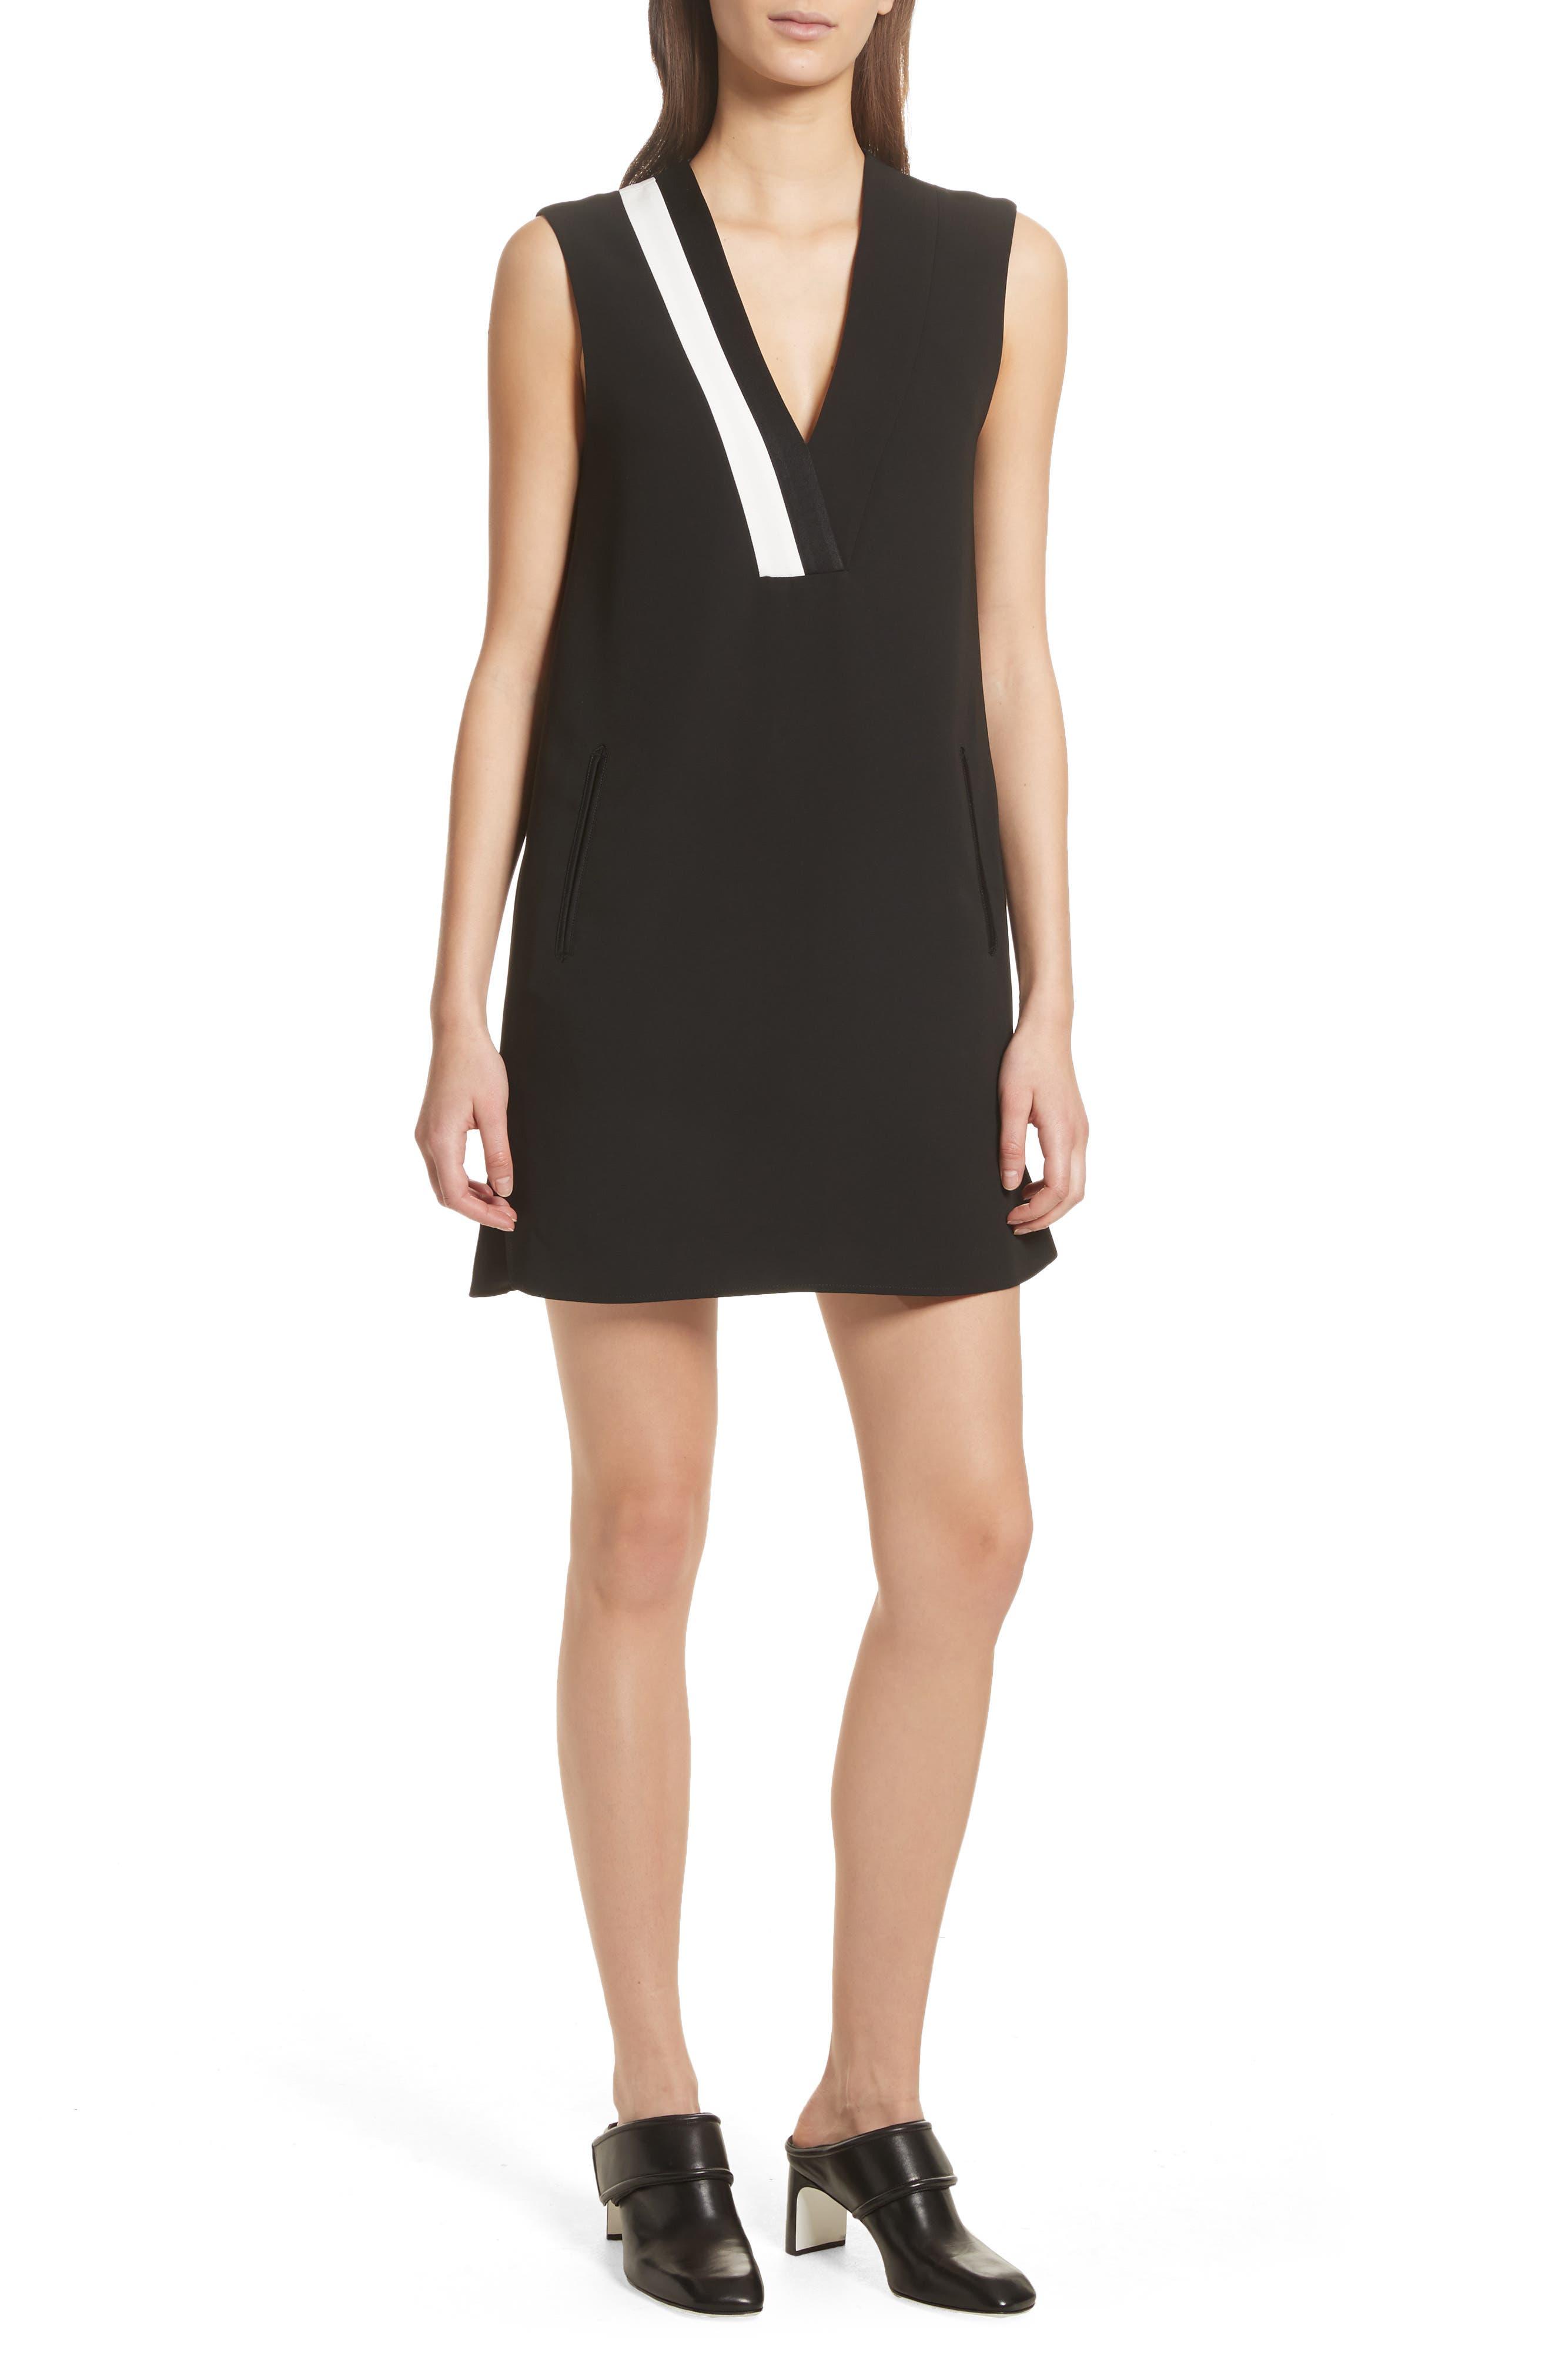 Lodwick Dress,                         Main,                         color, Black